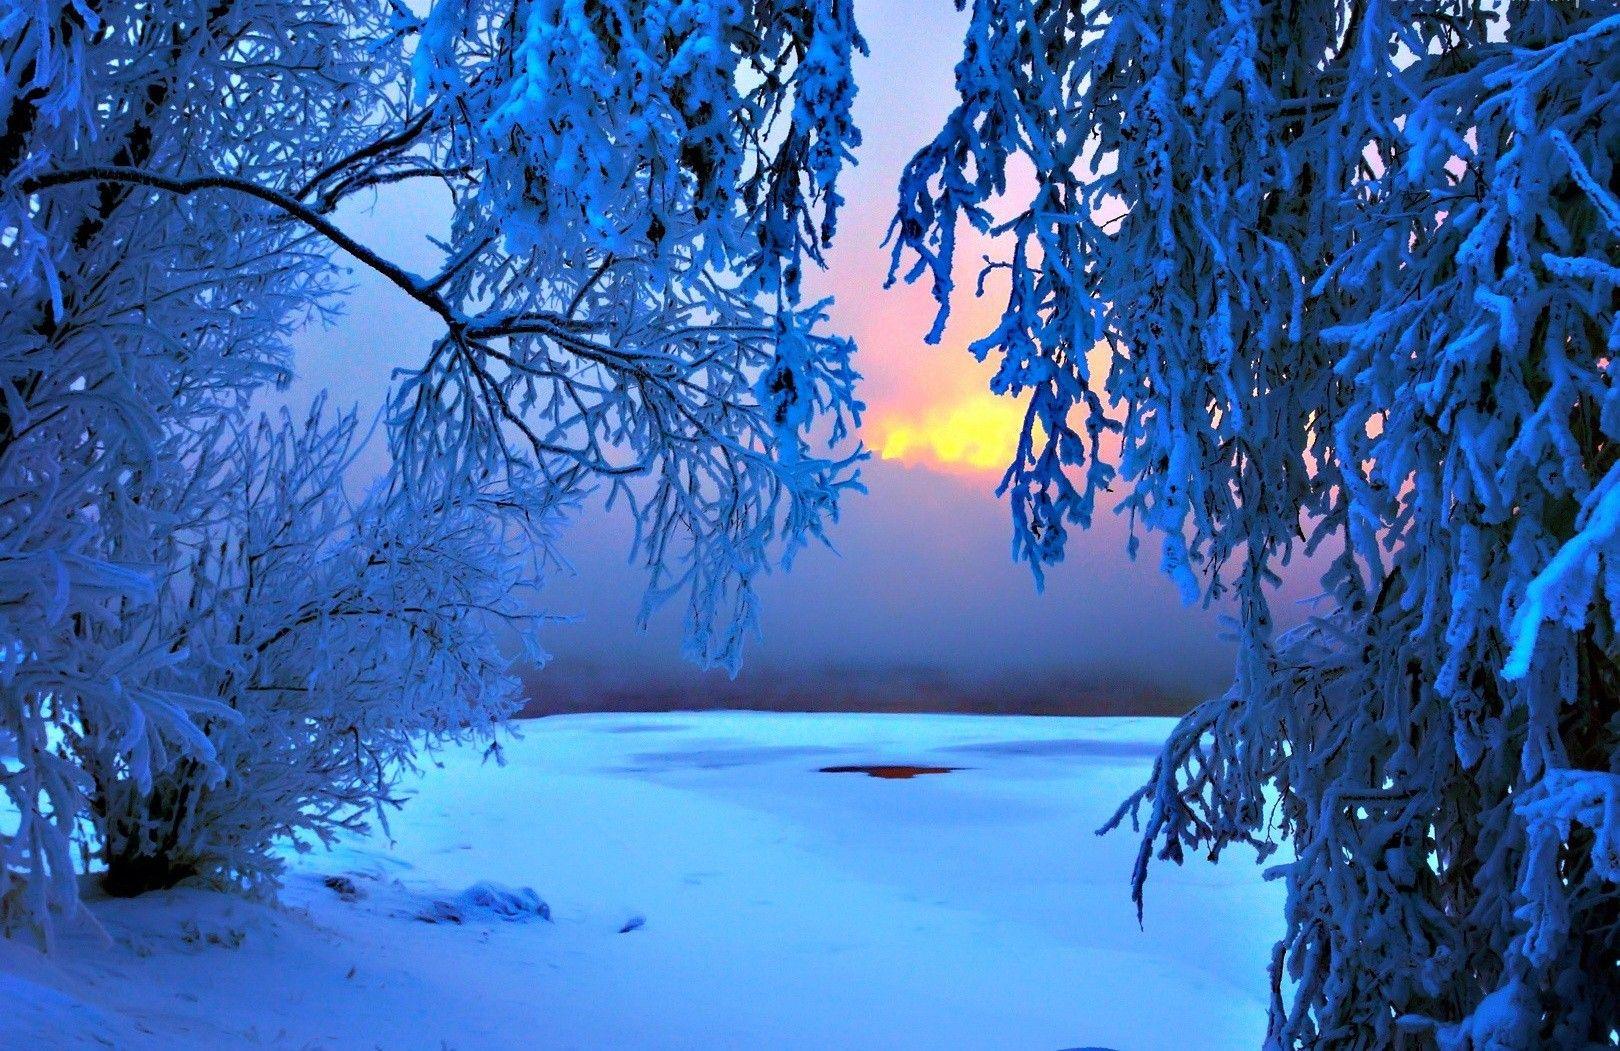 Winter Frost Sundow Glow Amazing Forest Branches Sunrise